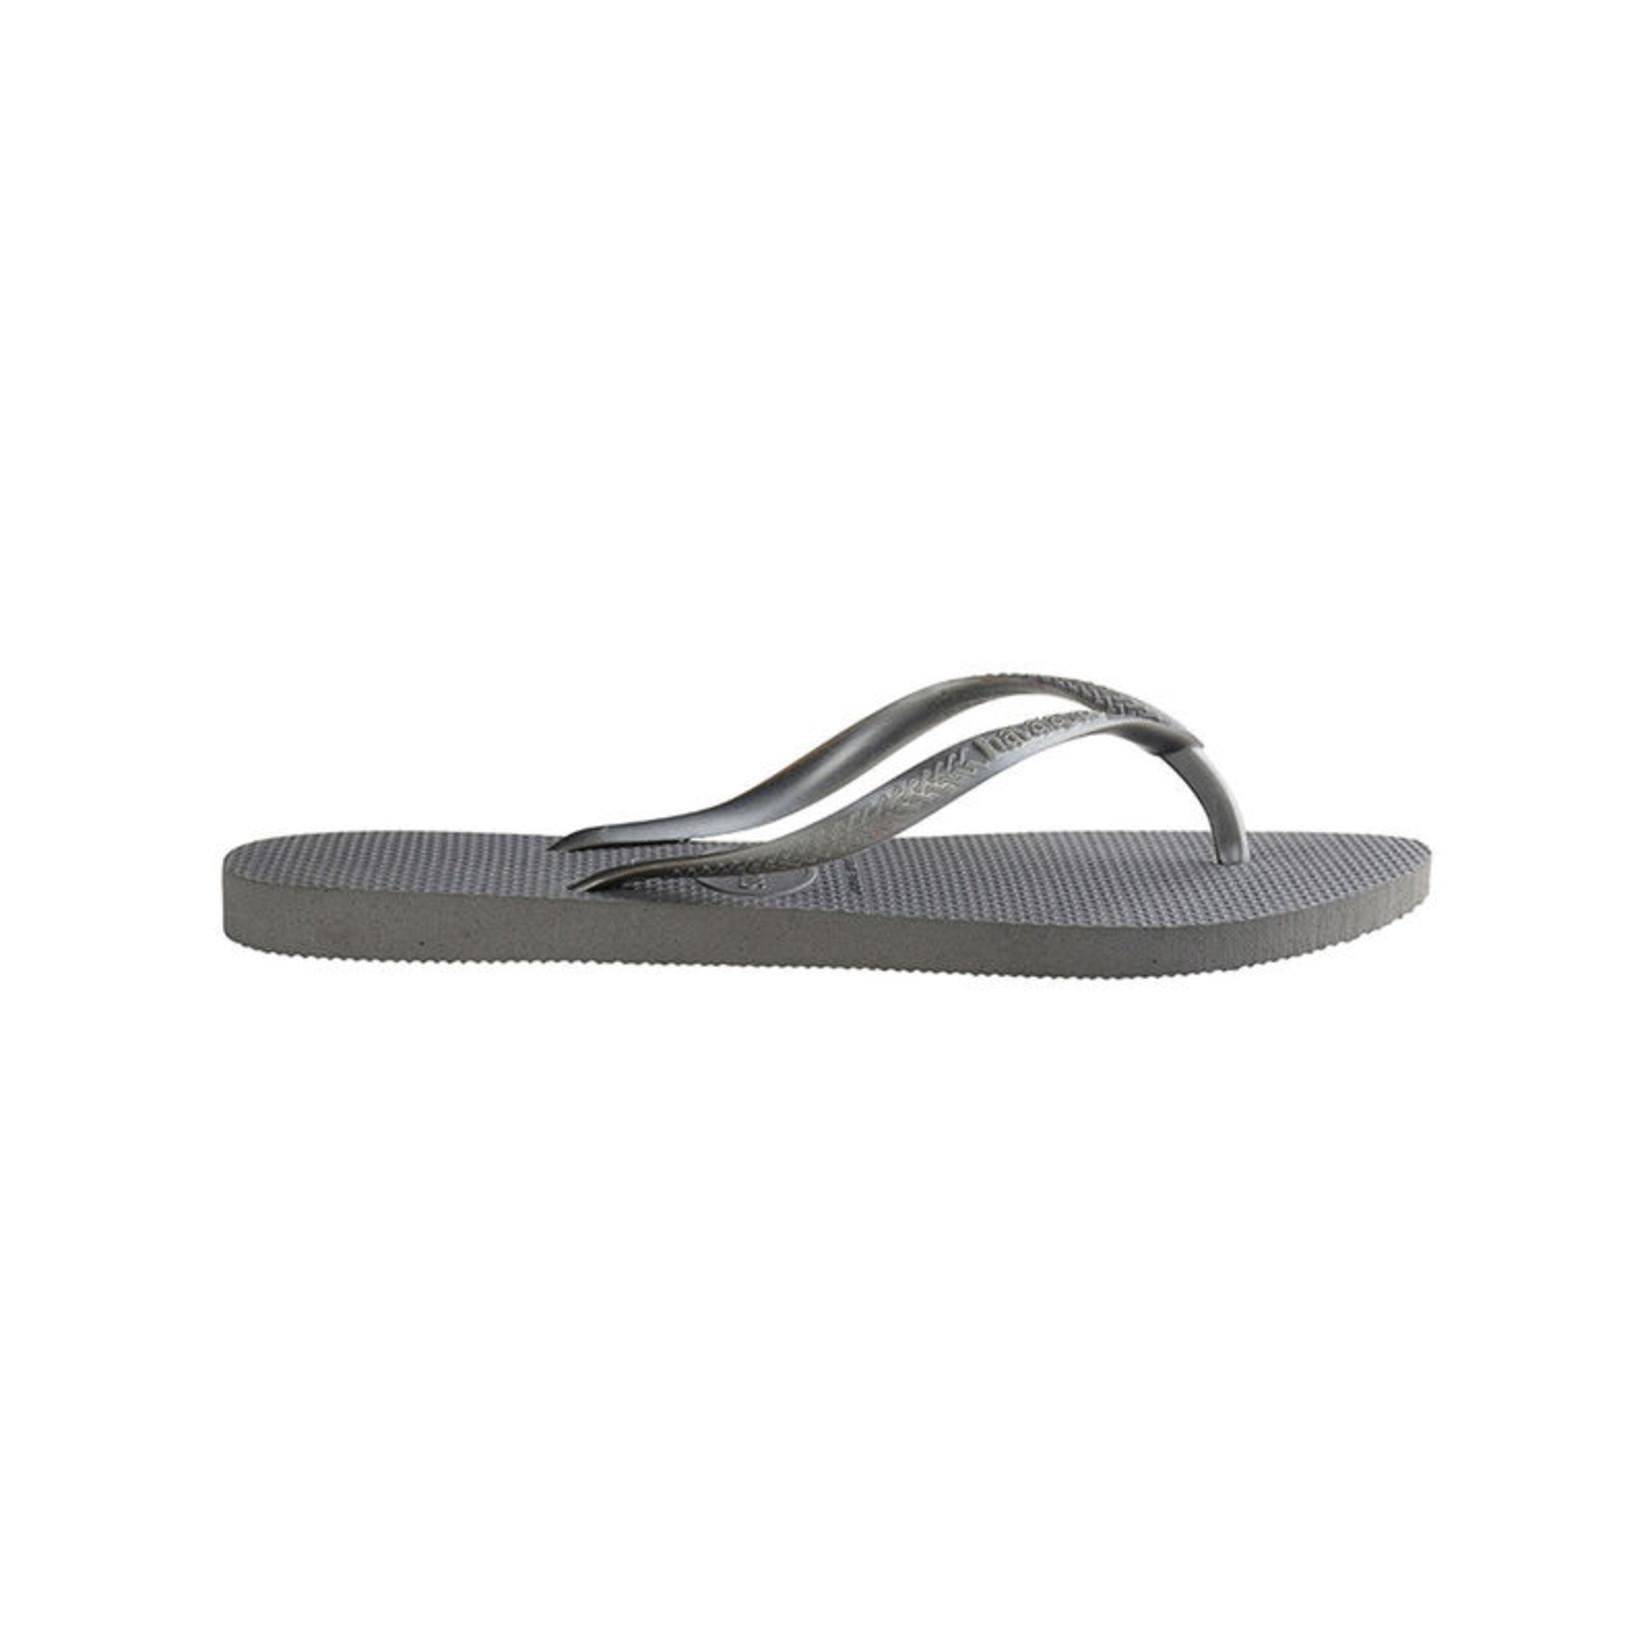 Havaianas Havaianas Slim Sandal Steel Grey FlipFlops